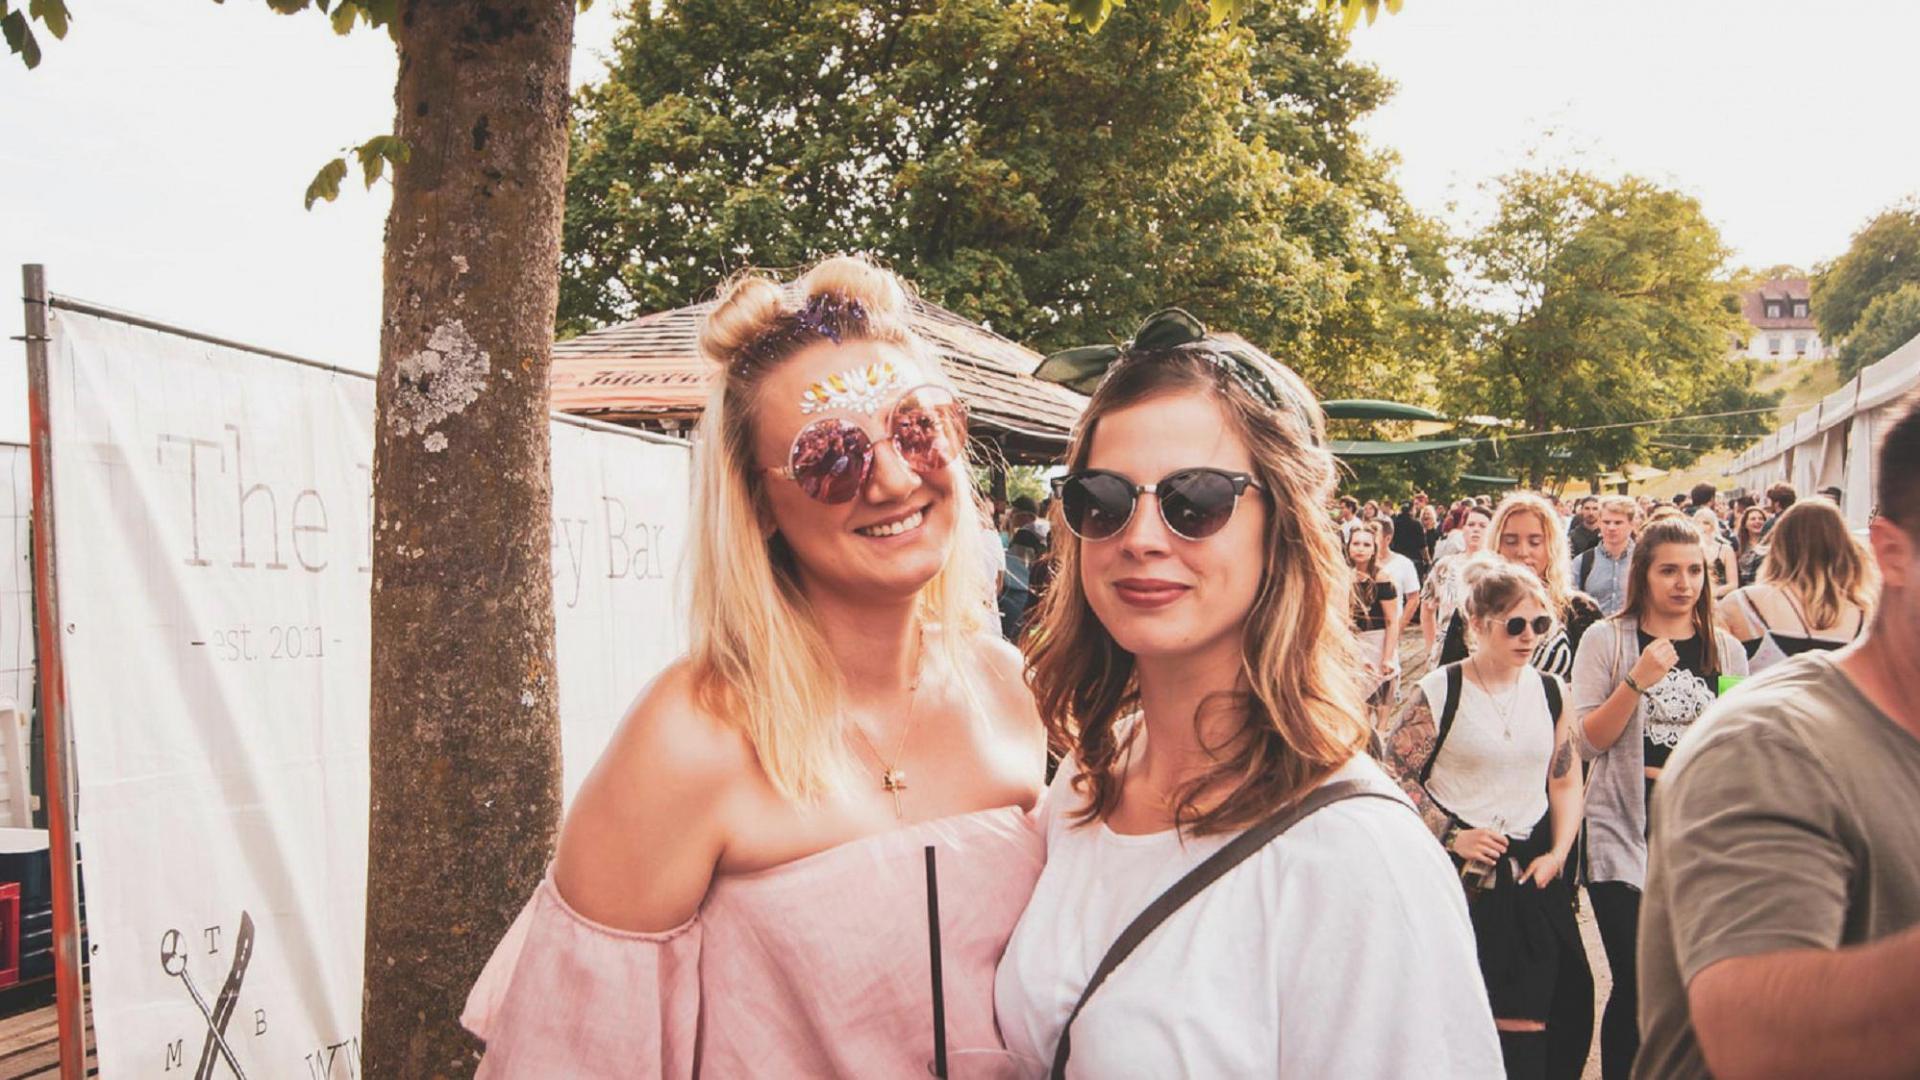 Beste Freundinnen auf dem Festival